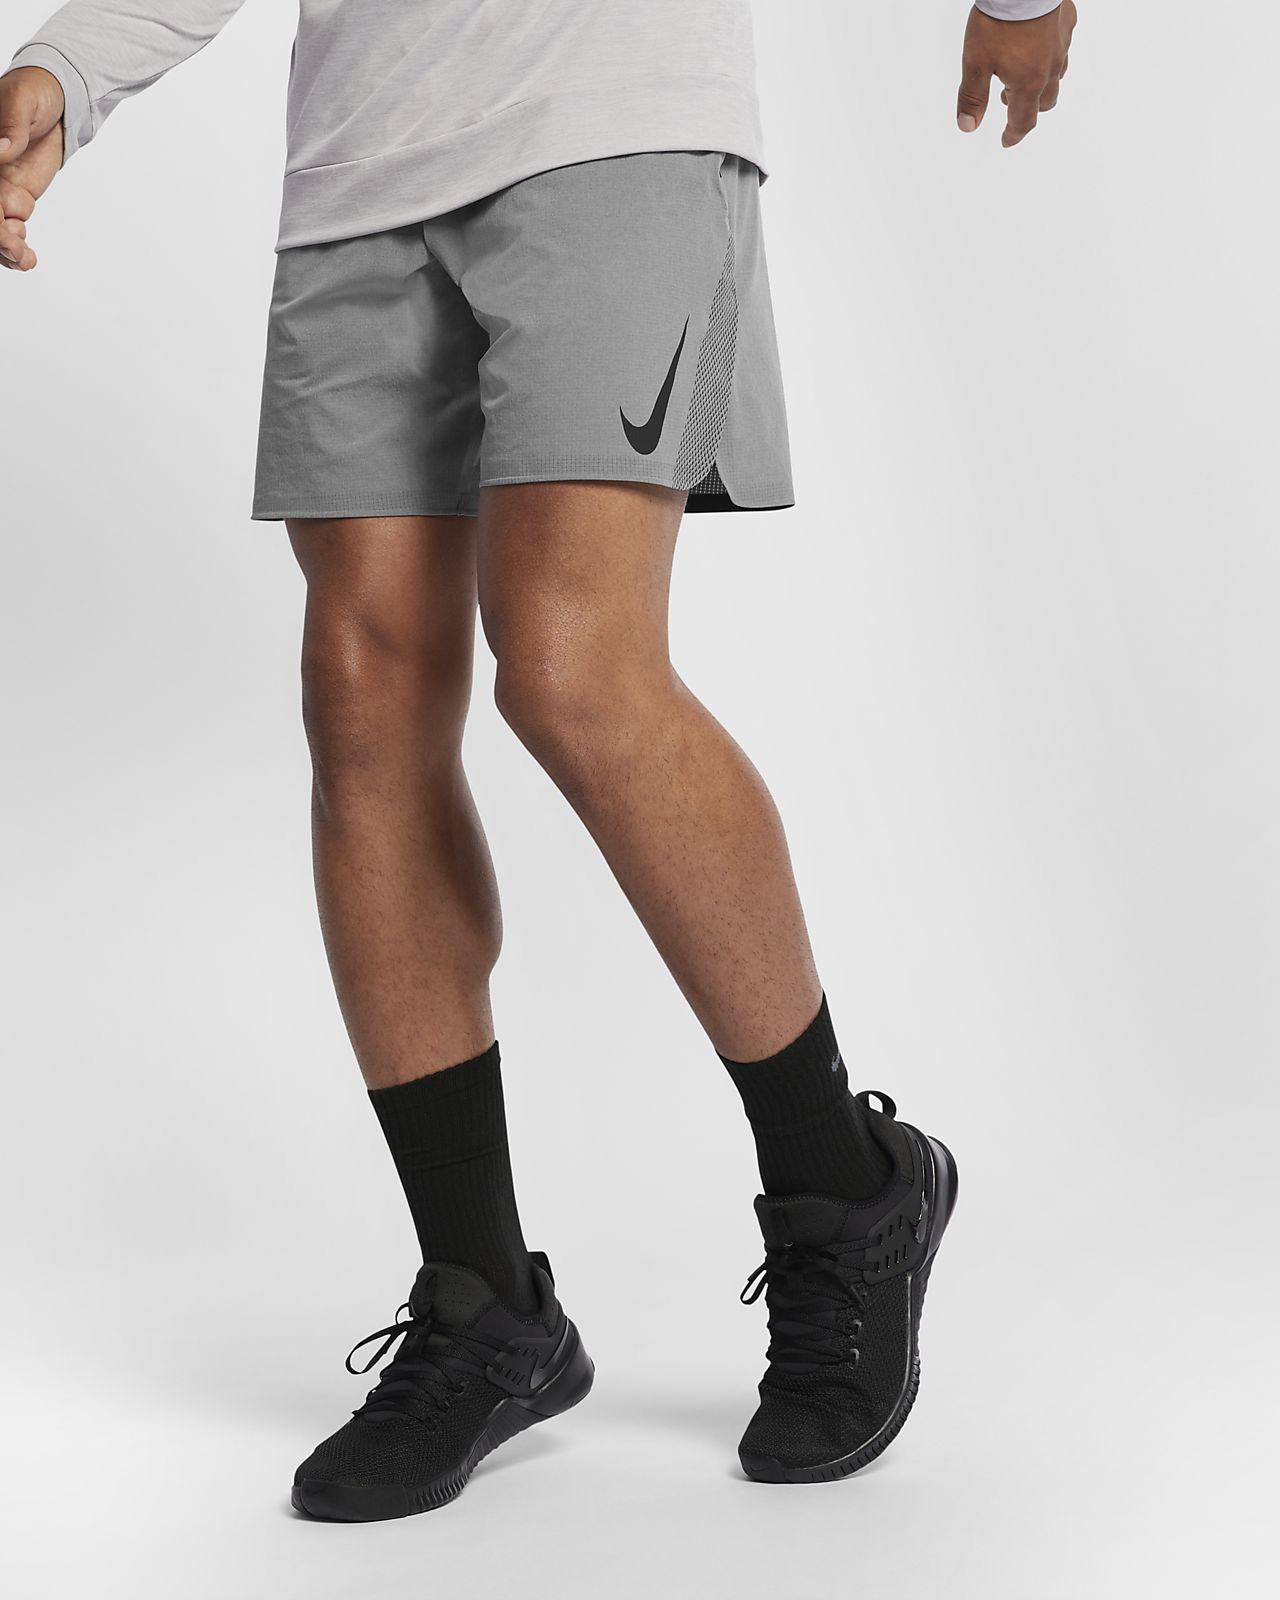 514368896f3a Nike Flex Repel Men s Training Shorts. Nike.com NZ